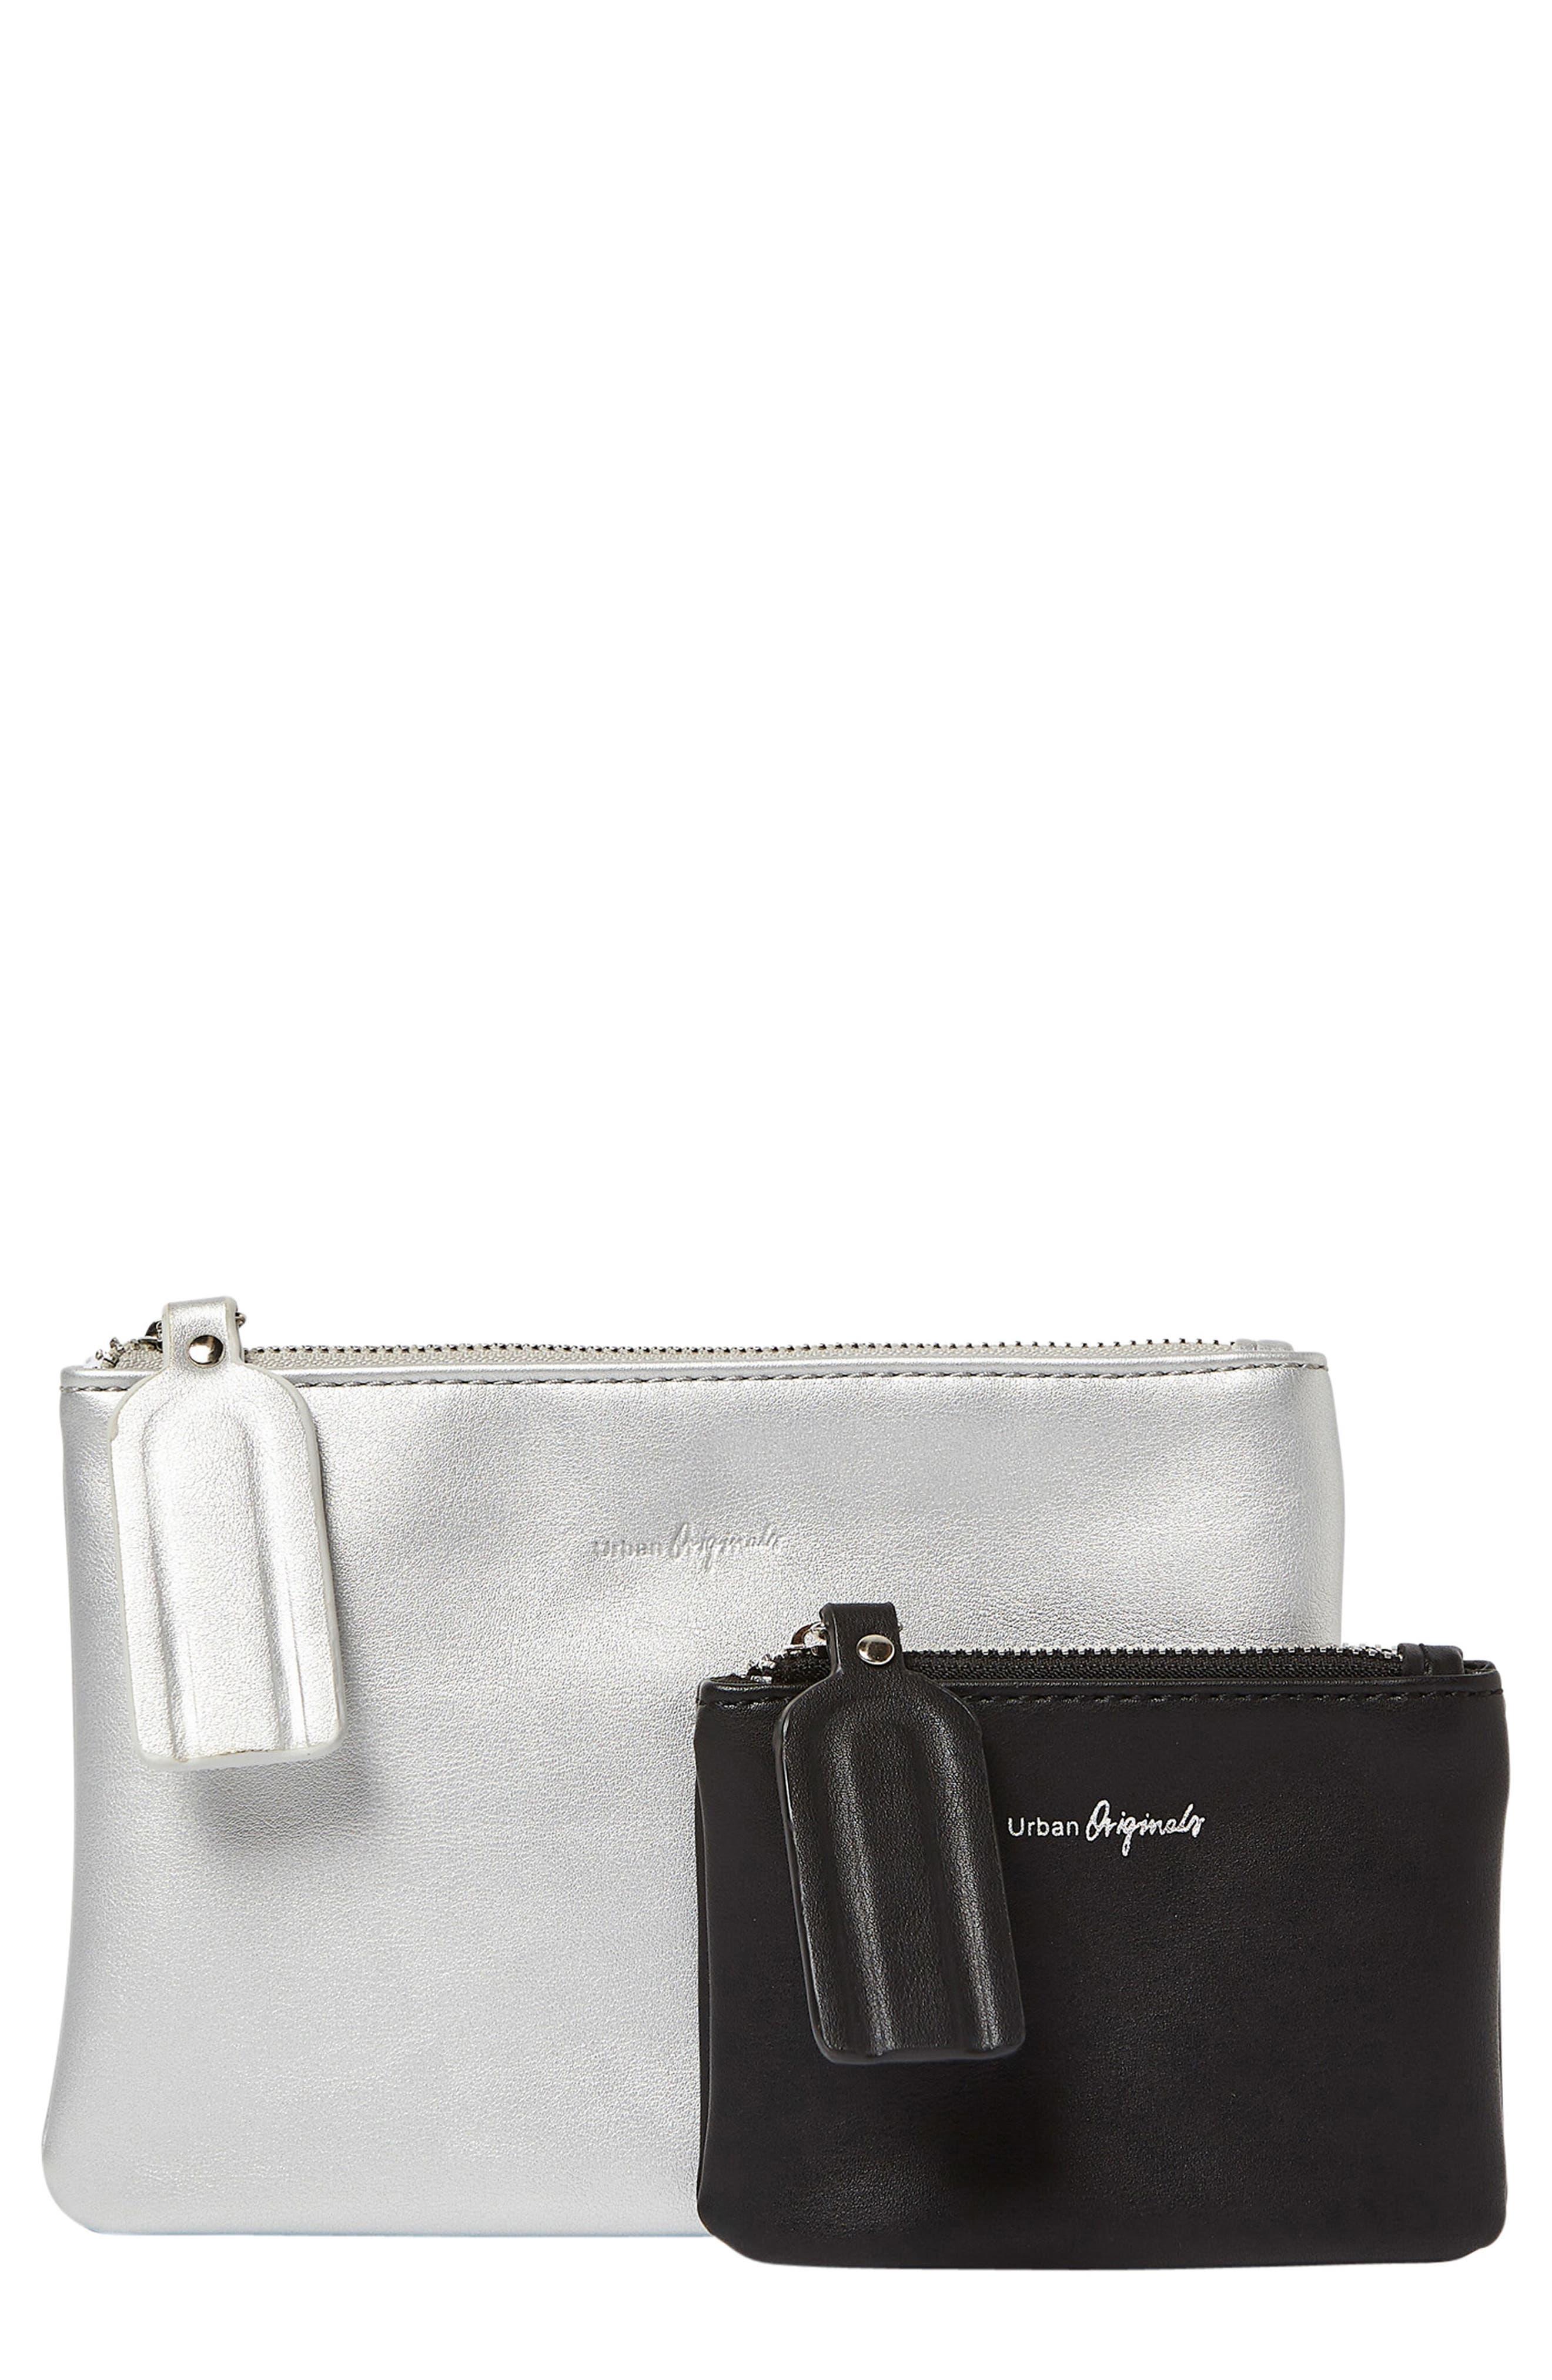 Dreamer 2-Pack Vegan Leather Card Cases,                         Main,                         color, Black/ Silver